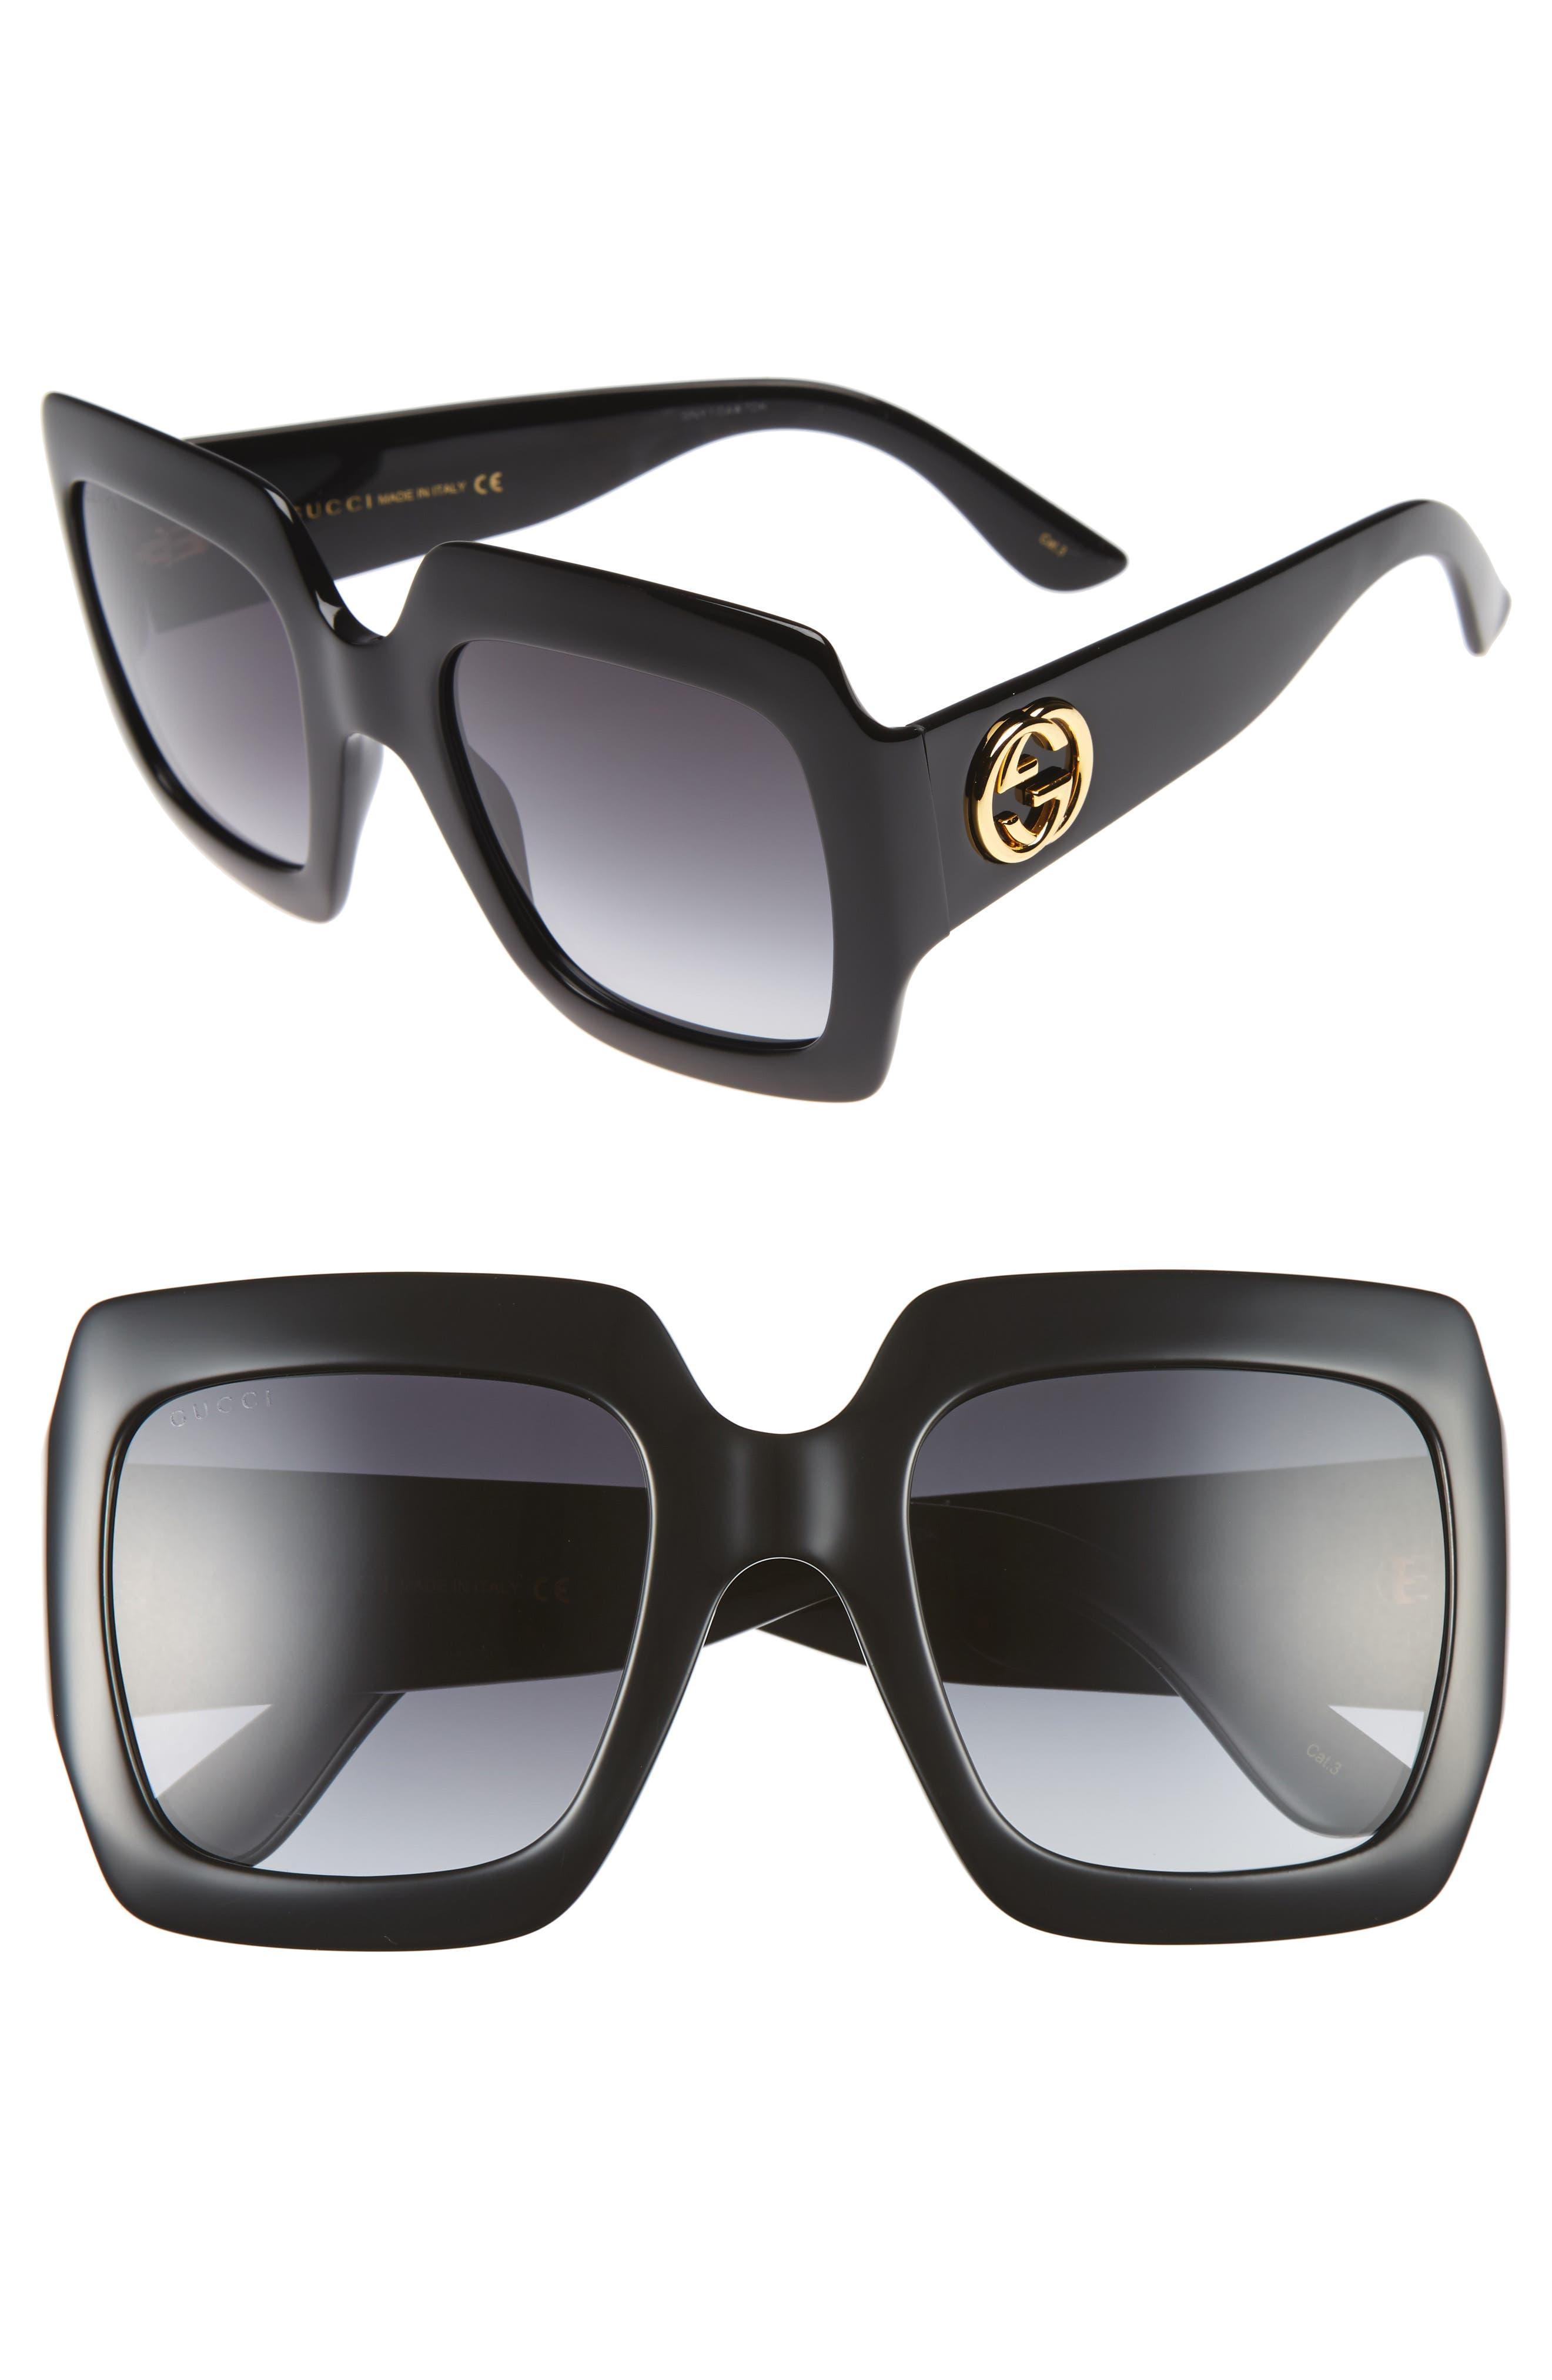 54mm Square Sunglasses,                             Main thumbnail 1, color,                             BLACK/ GREY